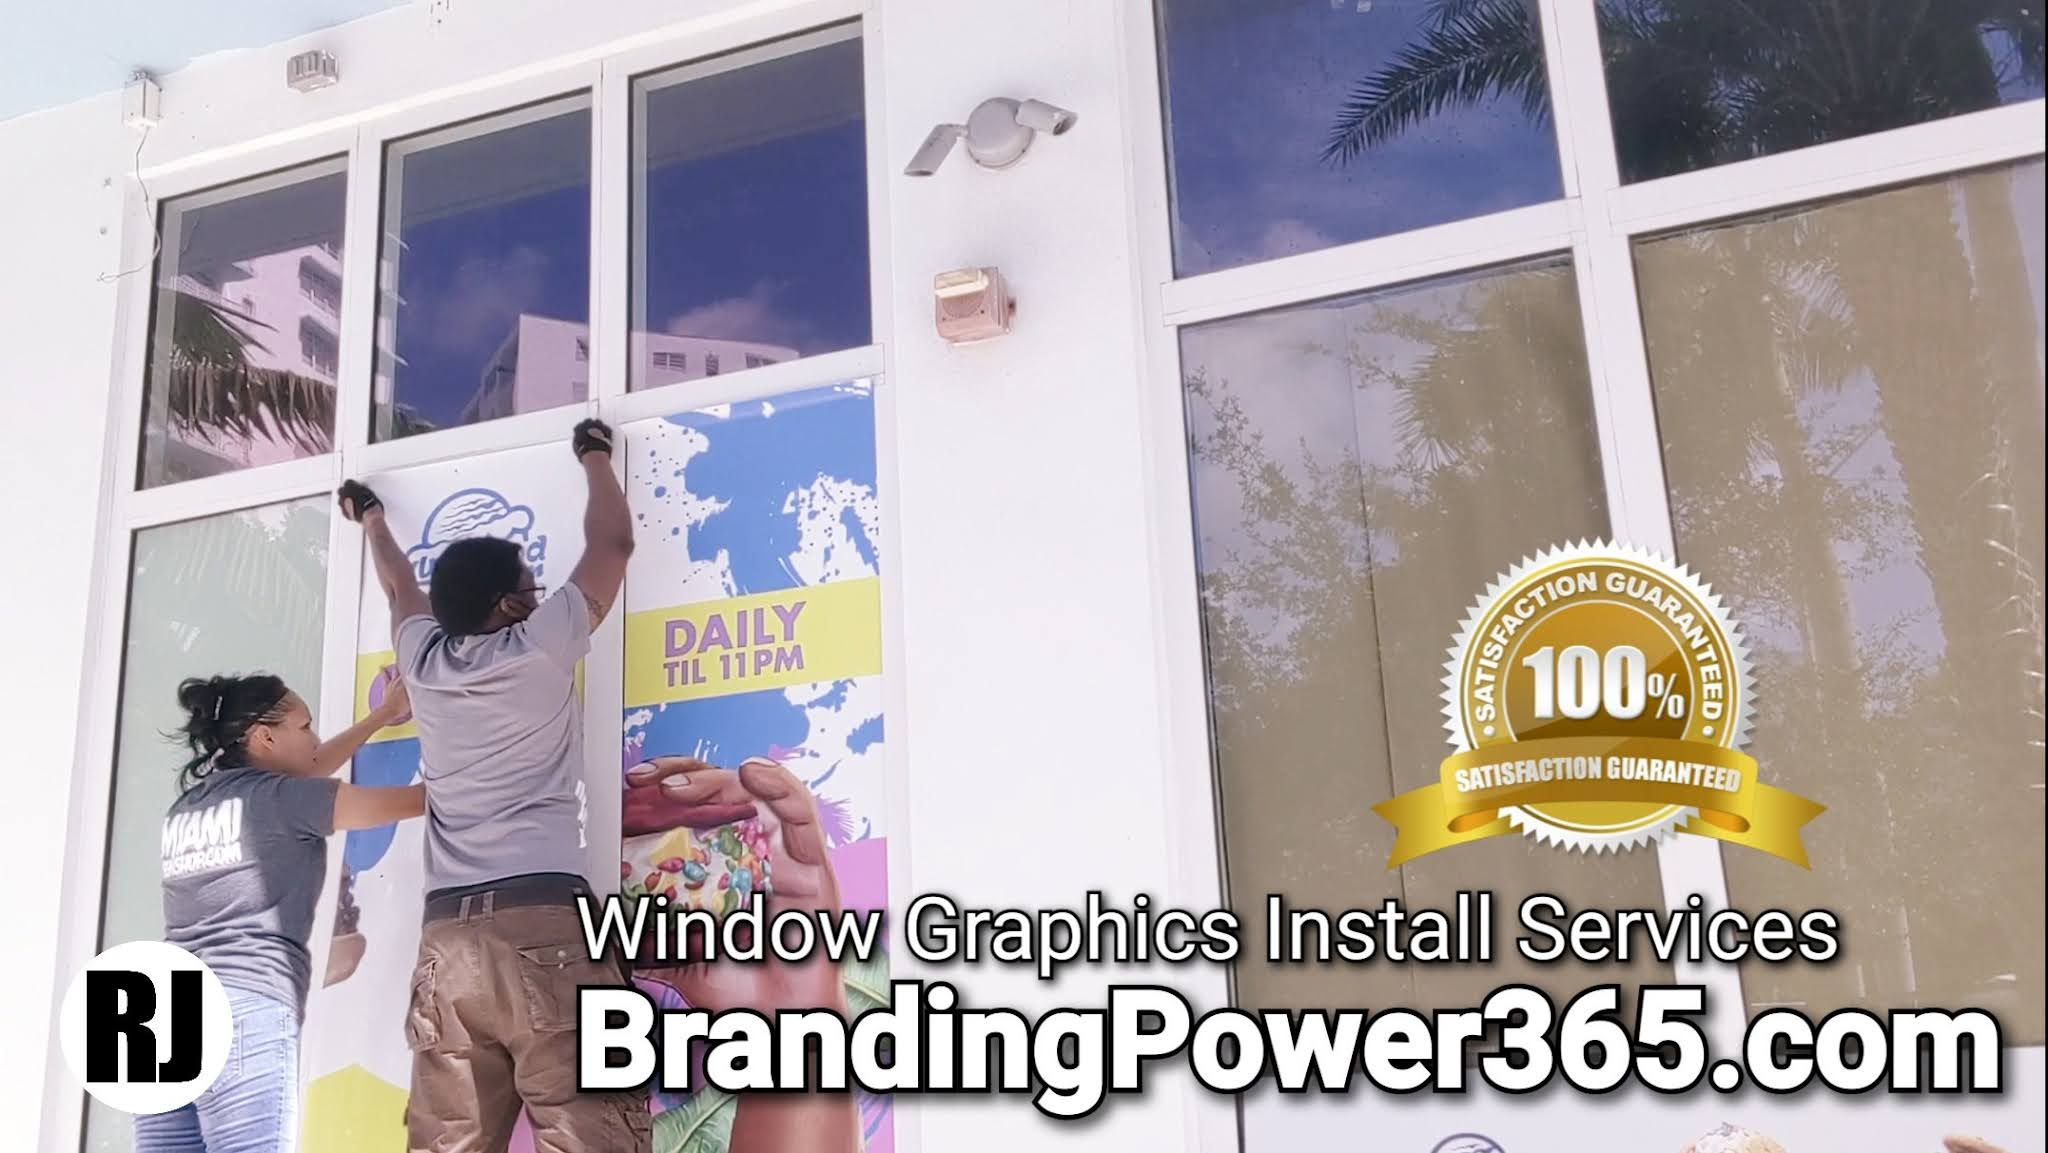 Window Graphics Installation Services in Miami. BrandingPower365.com